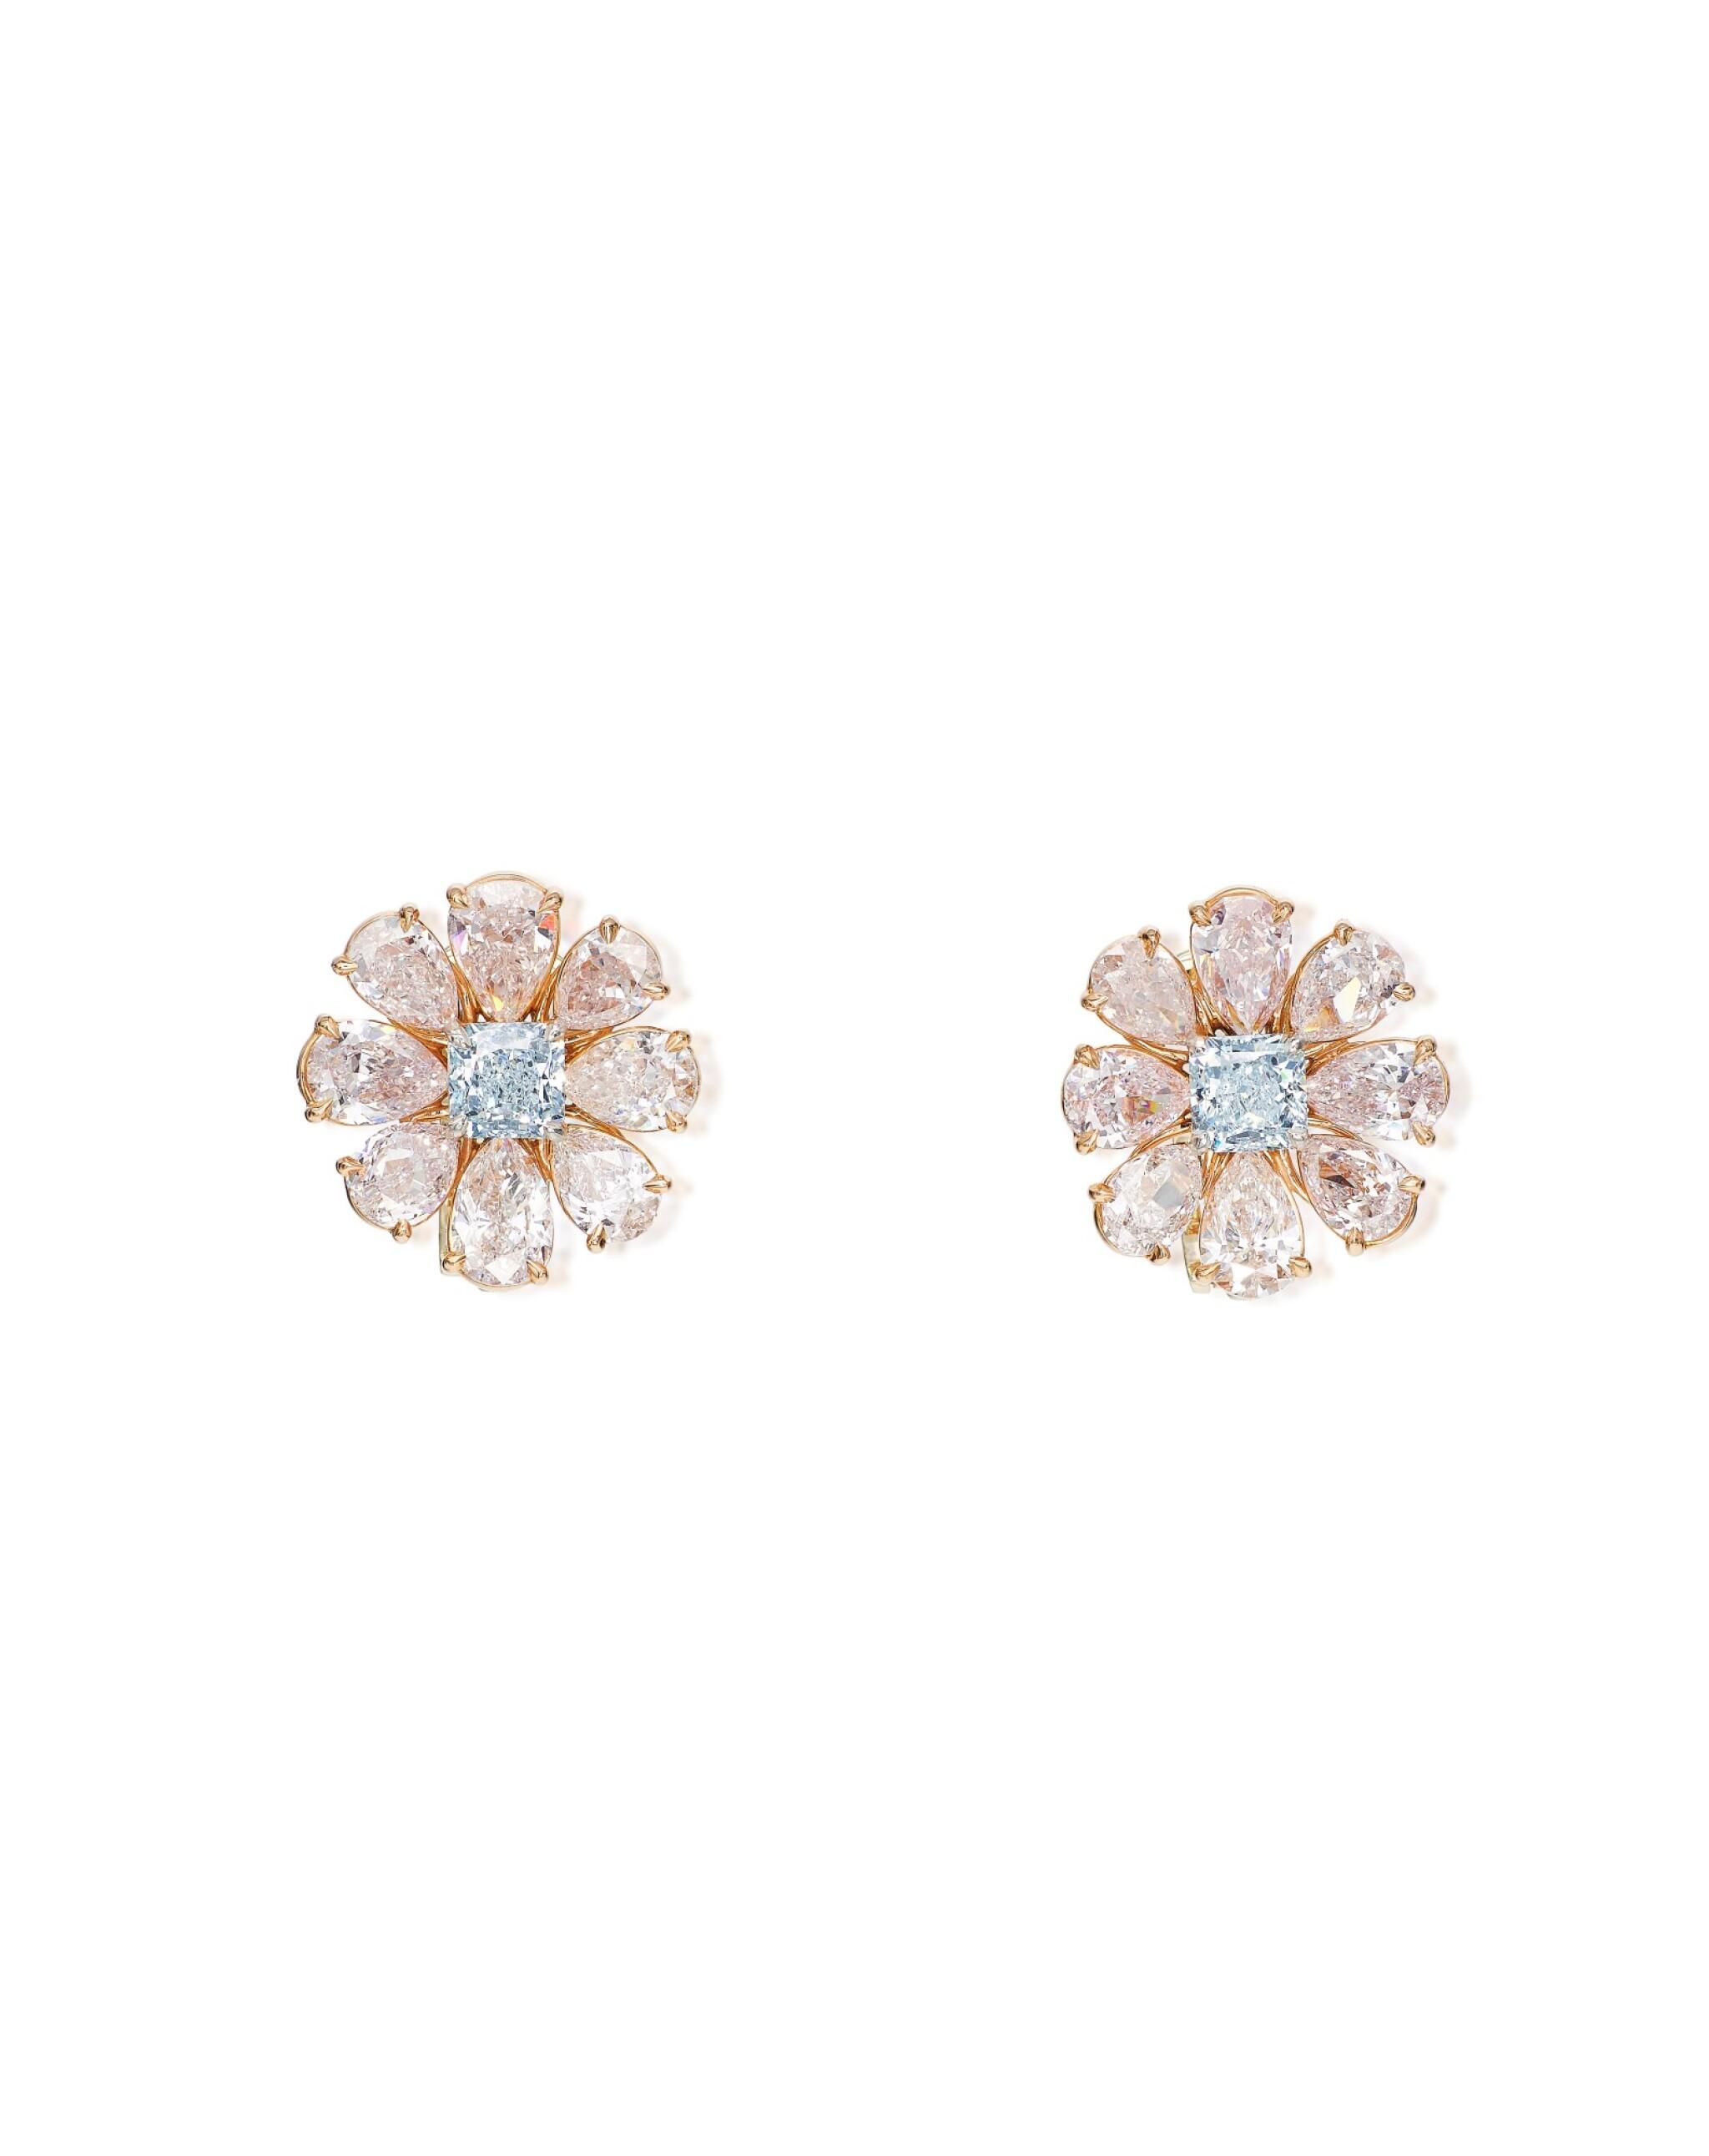 View full screen - View 1 of Lot 1634. PAIR OF LIGHT BLUE DIAMOND AND COLOURED DIAMOND EARRINGS   淡藍色鑽石 配 彩色鑽石 耳環一對 (淡藍色鑽石及彩色鑽石共重1.55及8.41卡拉 ).